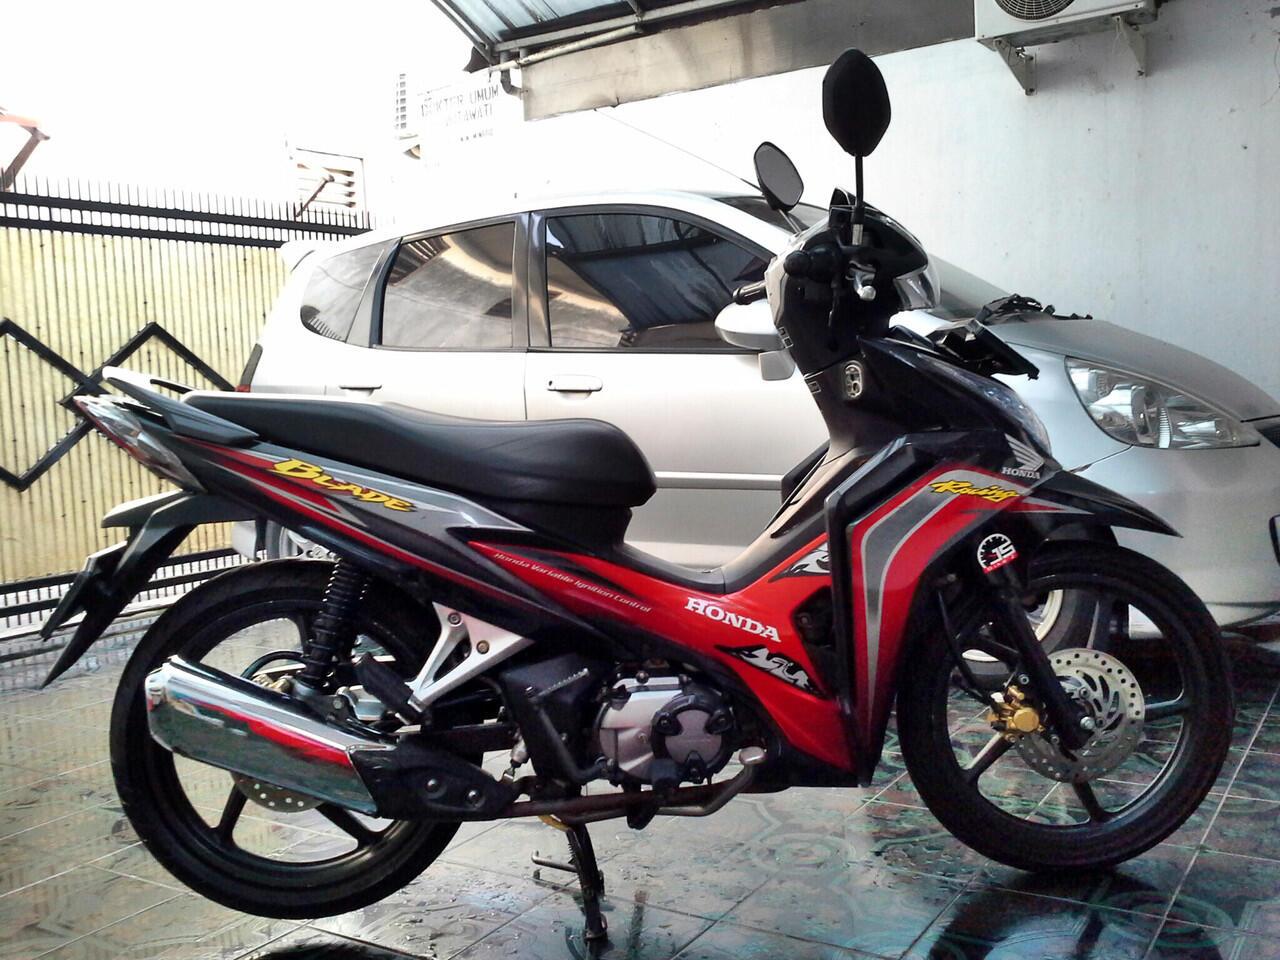 Jual Honda New blade 2011